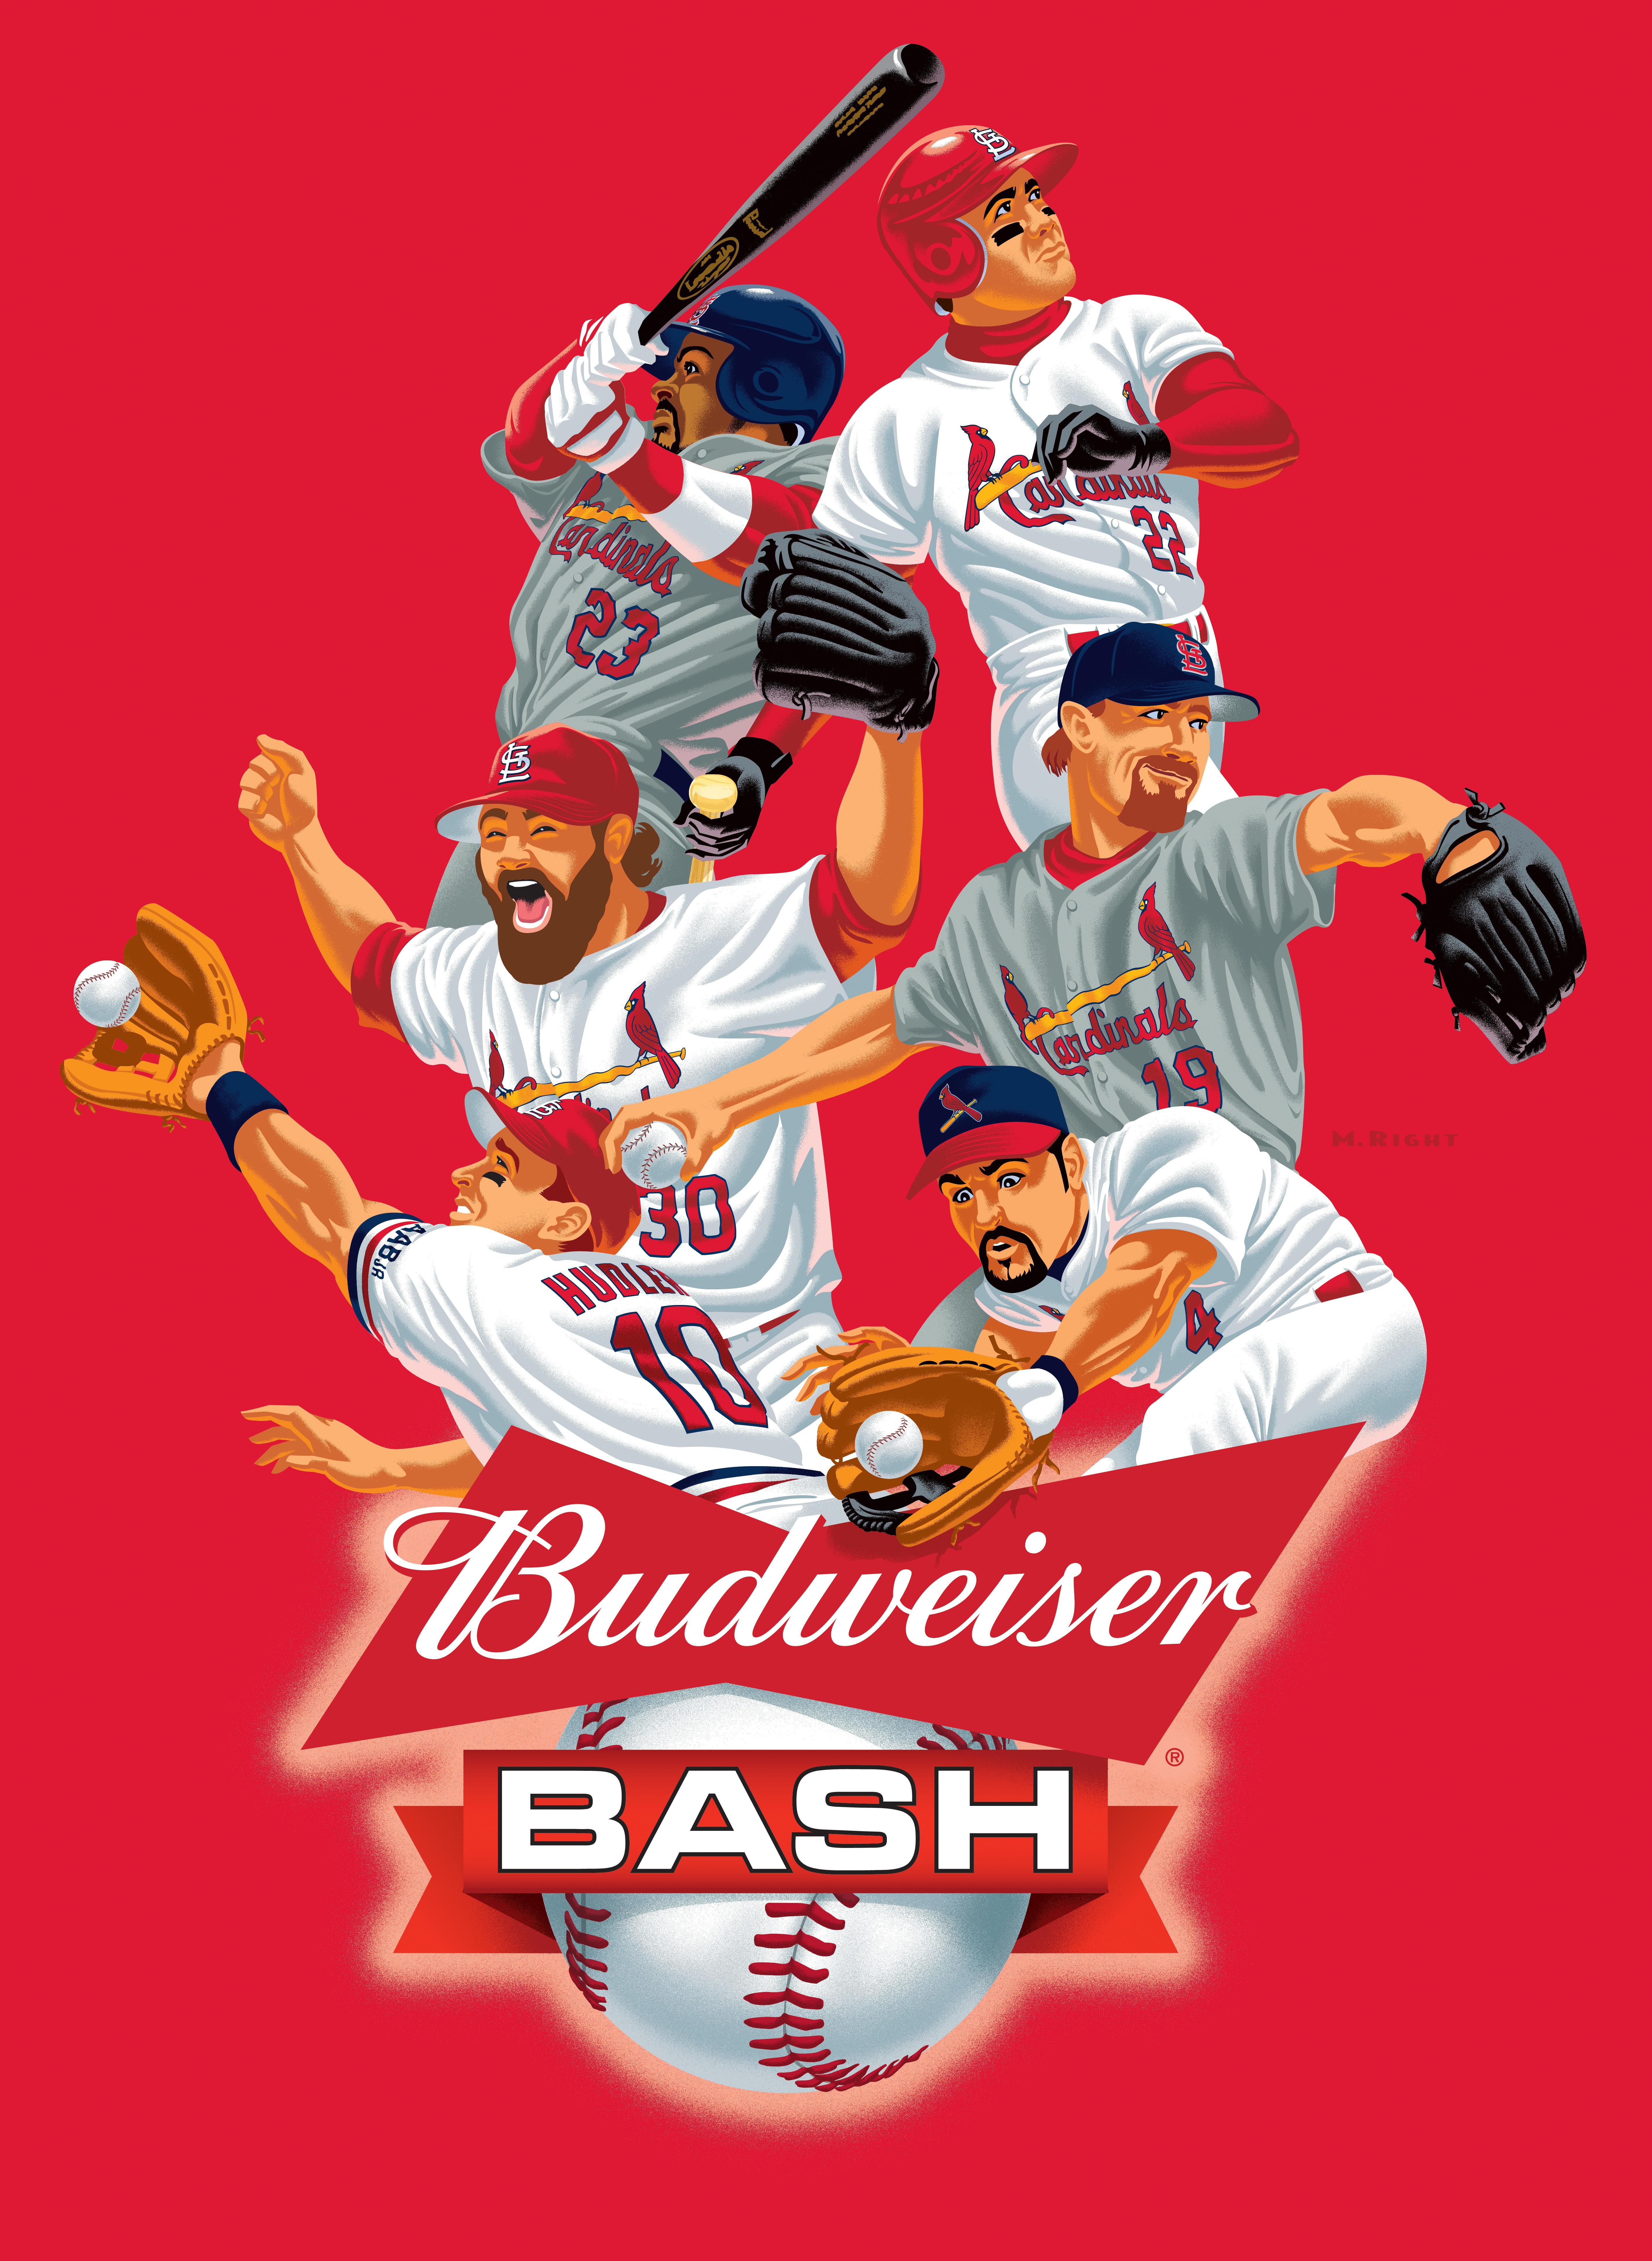 2019 Cardinal Budweiser Bash Banner